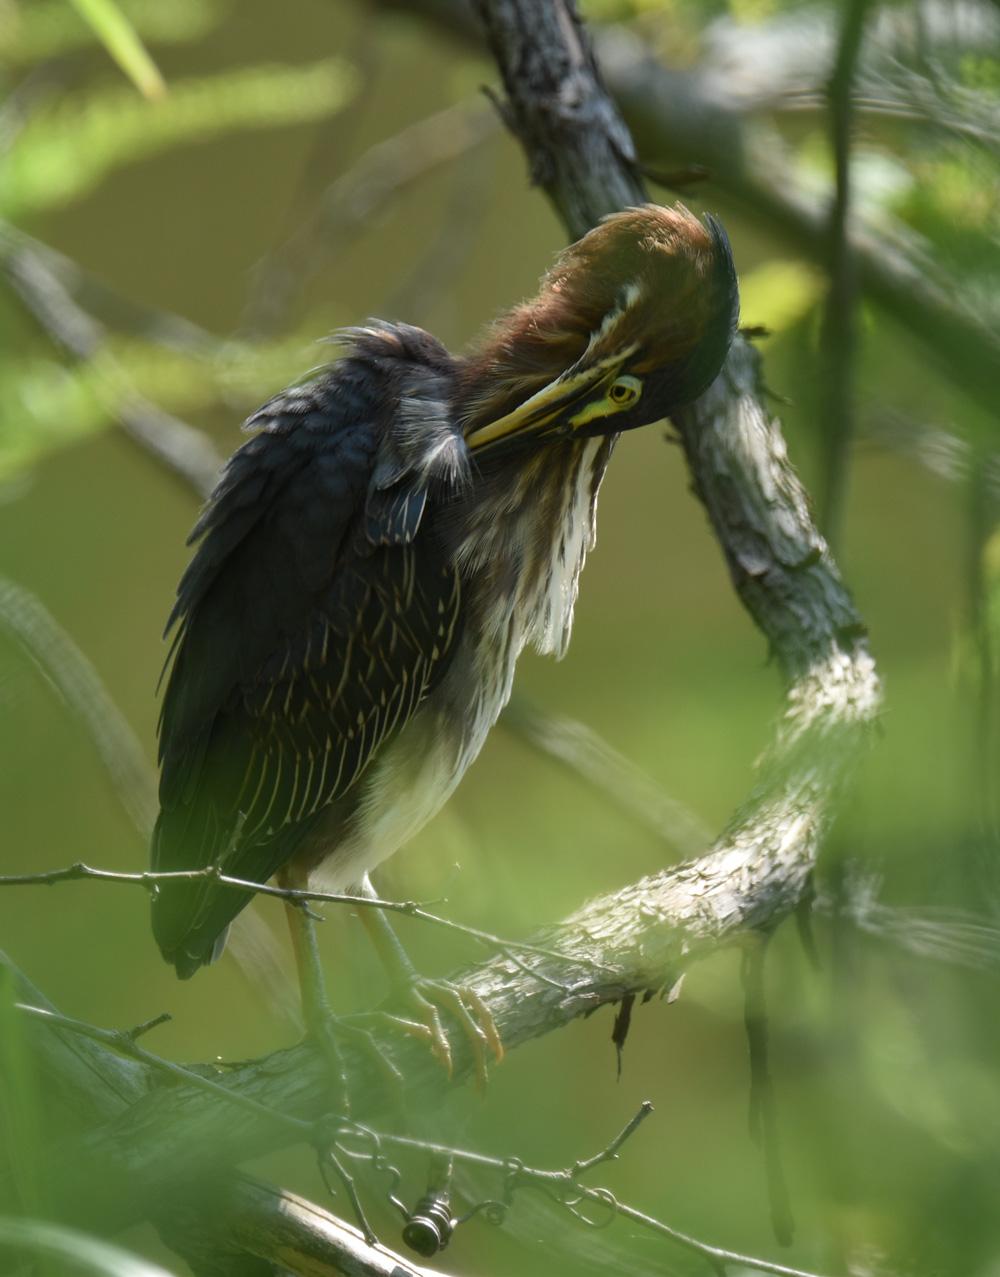 Photo of Green Heron 3 Urquhart on NaturalCrooksDotCom